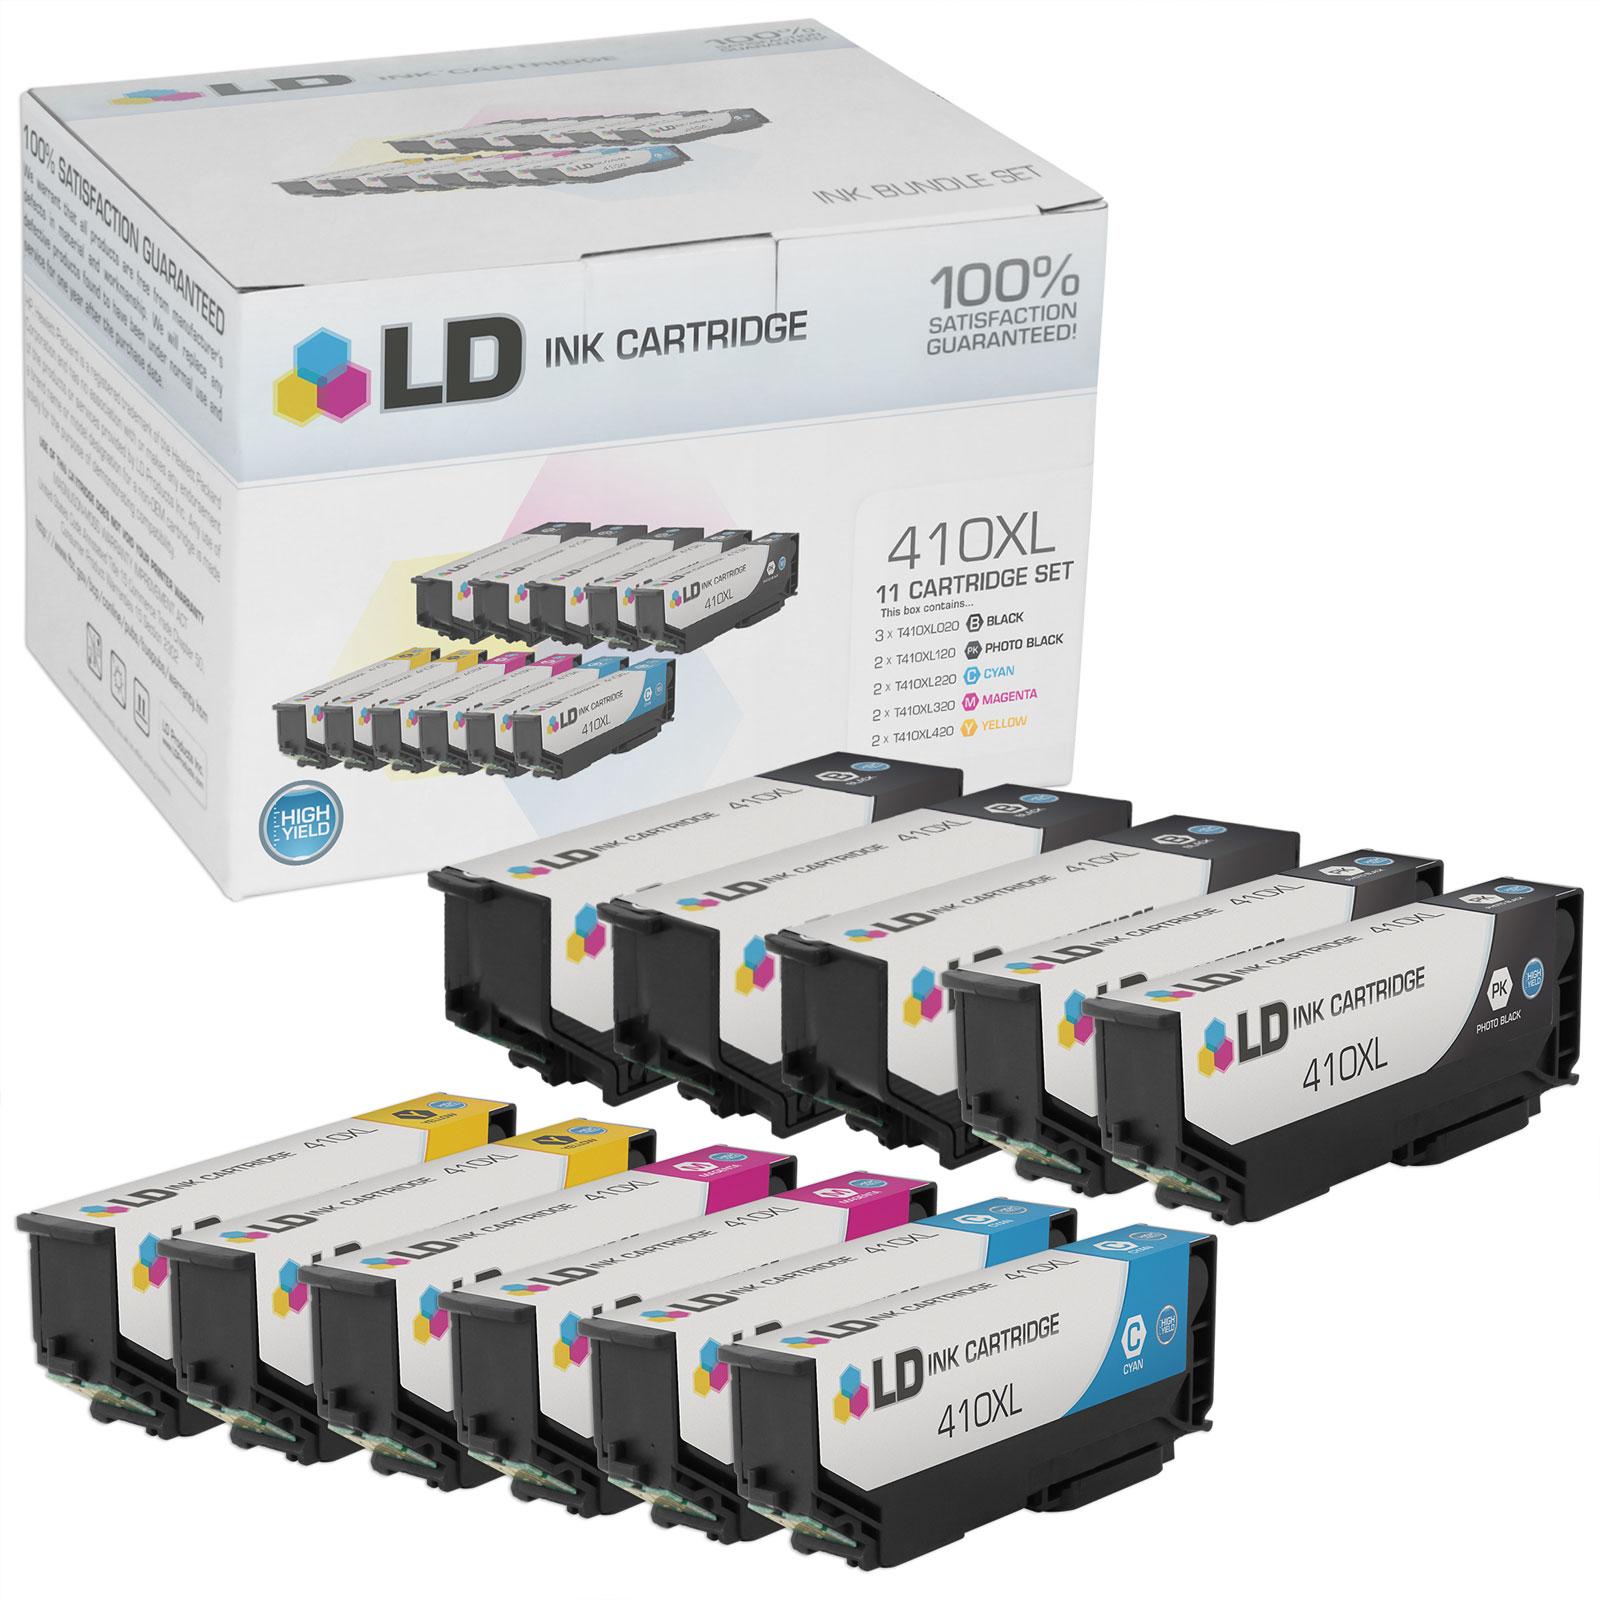 LD Remanufactured Epson 410 / 410XL / T410XL Set of 11 High Yield Ink Cartridges (3 Black, 2 Cyan, 2 Magenta, 2 Yellow & 2 Photo Black) for Expression XP-530, XP-630, XP-635, XP-640 & XP-830